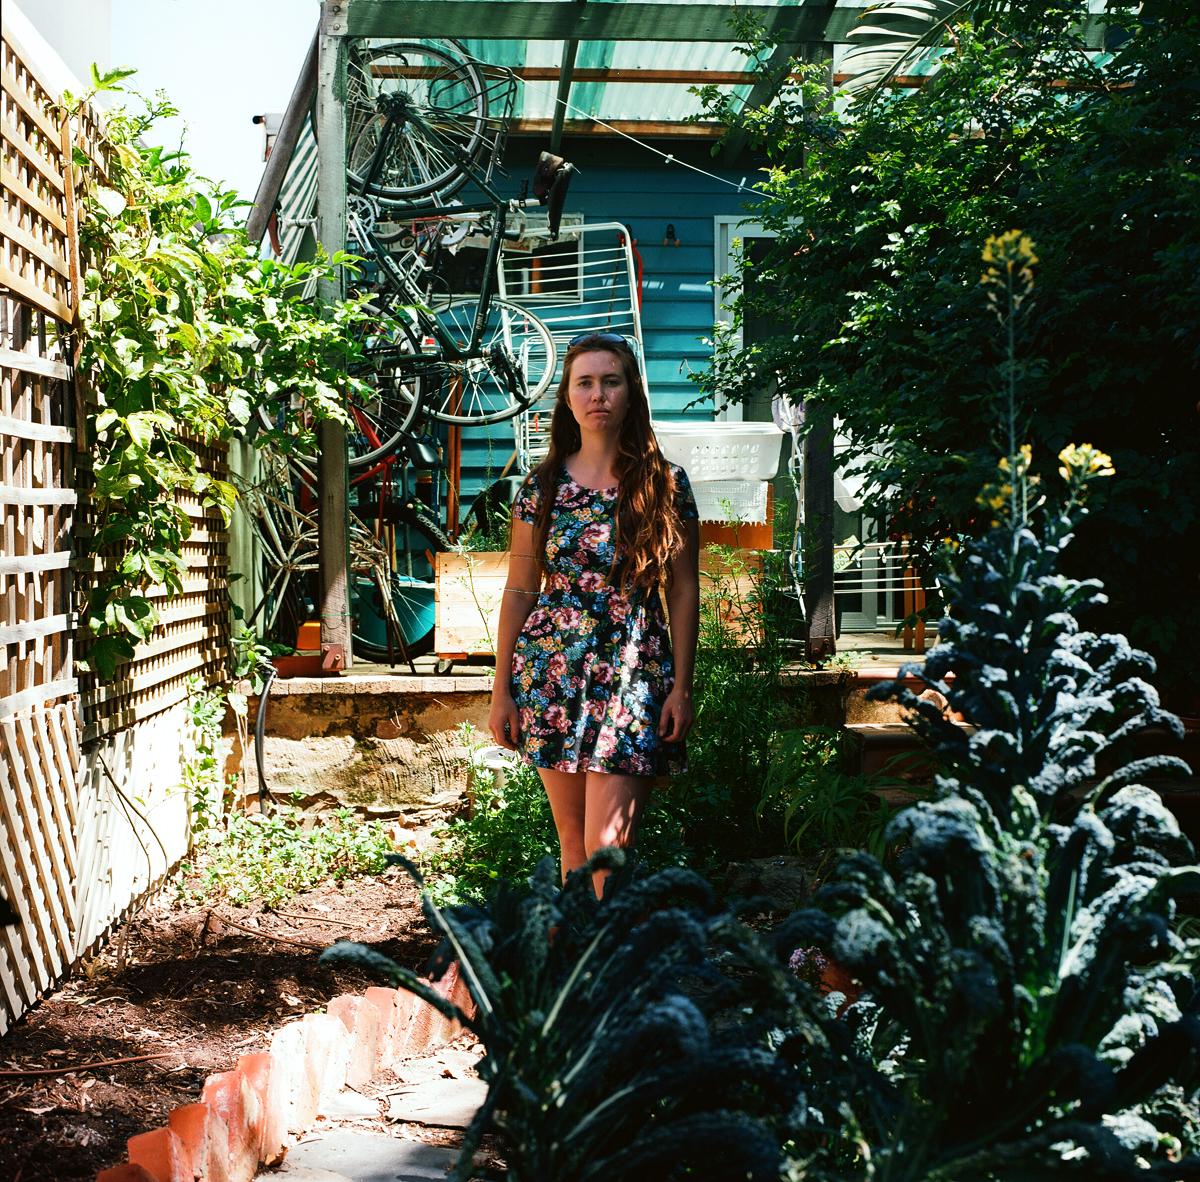 Gardener Archive. 2016. Karina in her garden in Fremantle, Perth, Australia